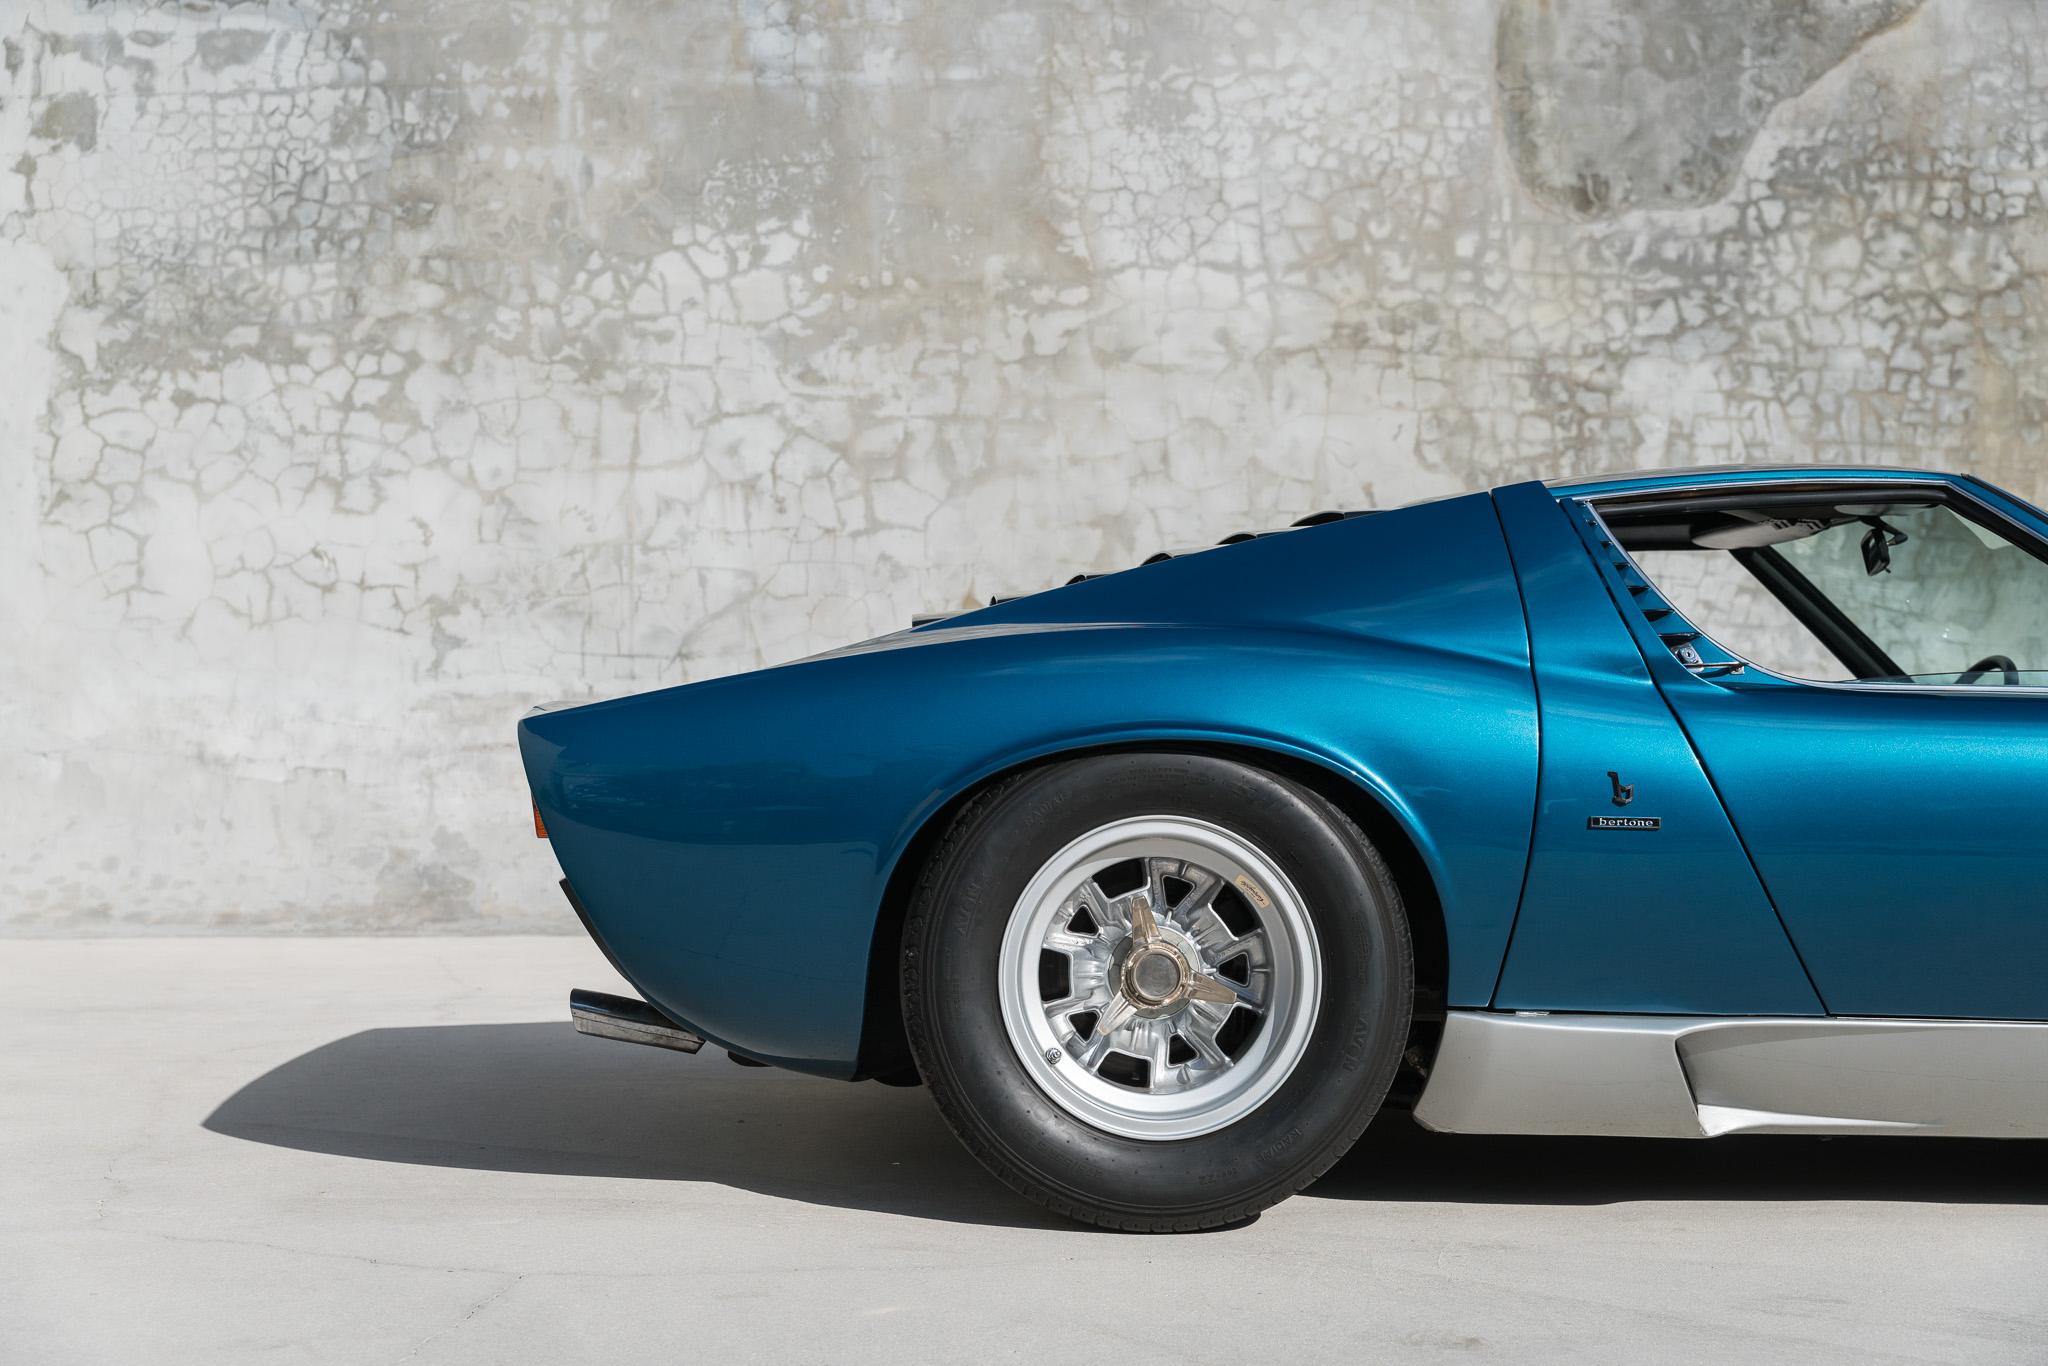 Lamborghini Miura S For Sale Curated Vintage Classic Supercars